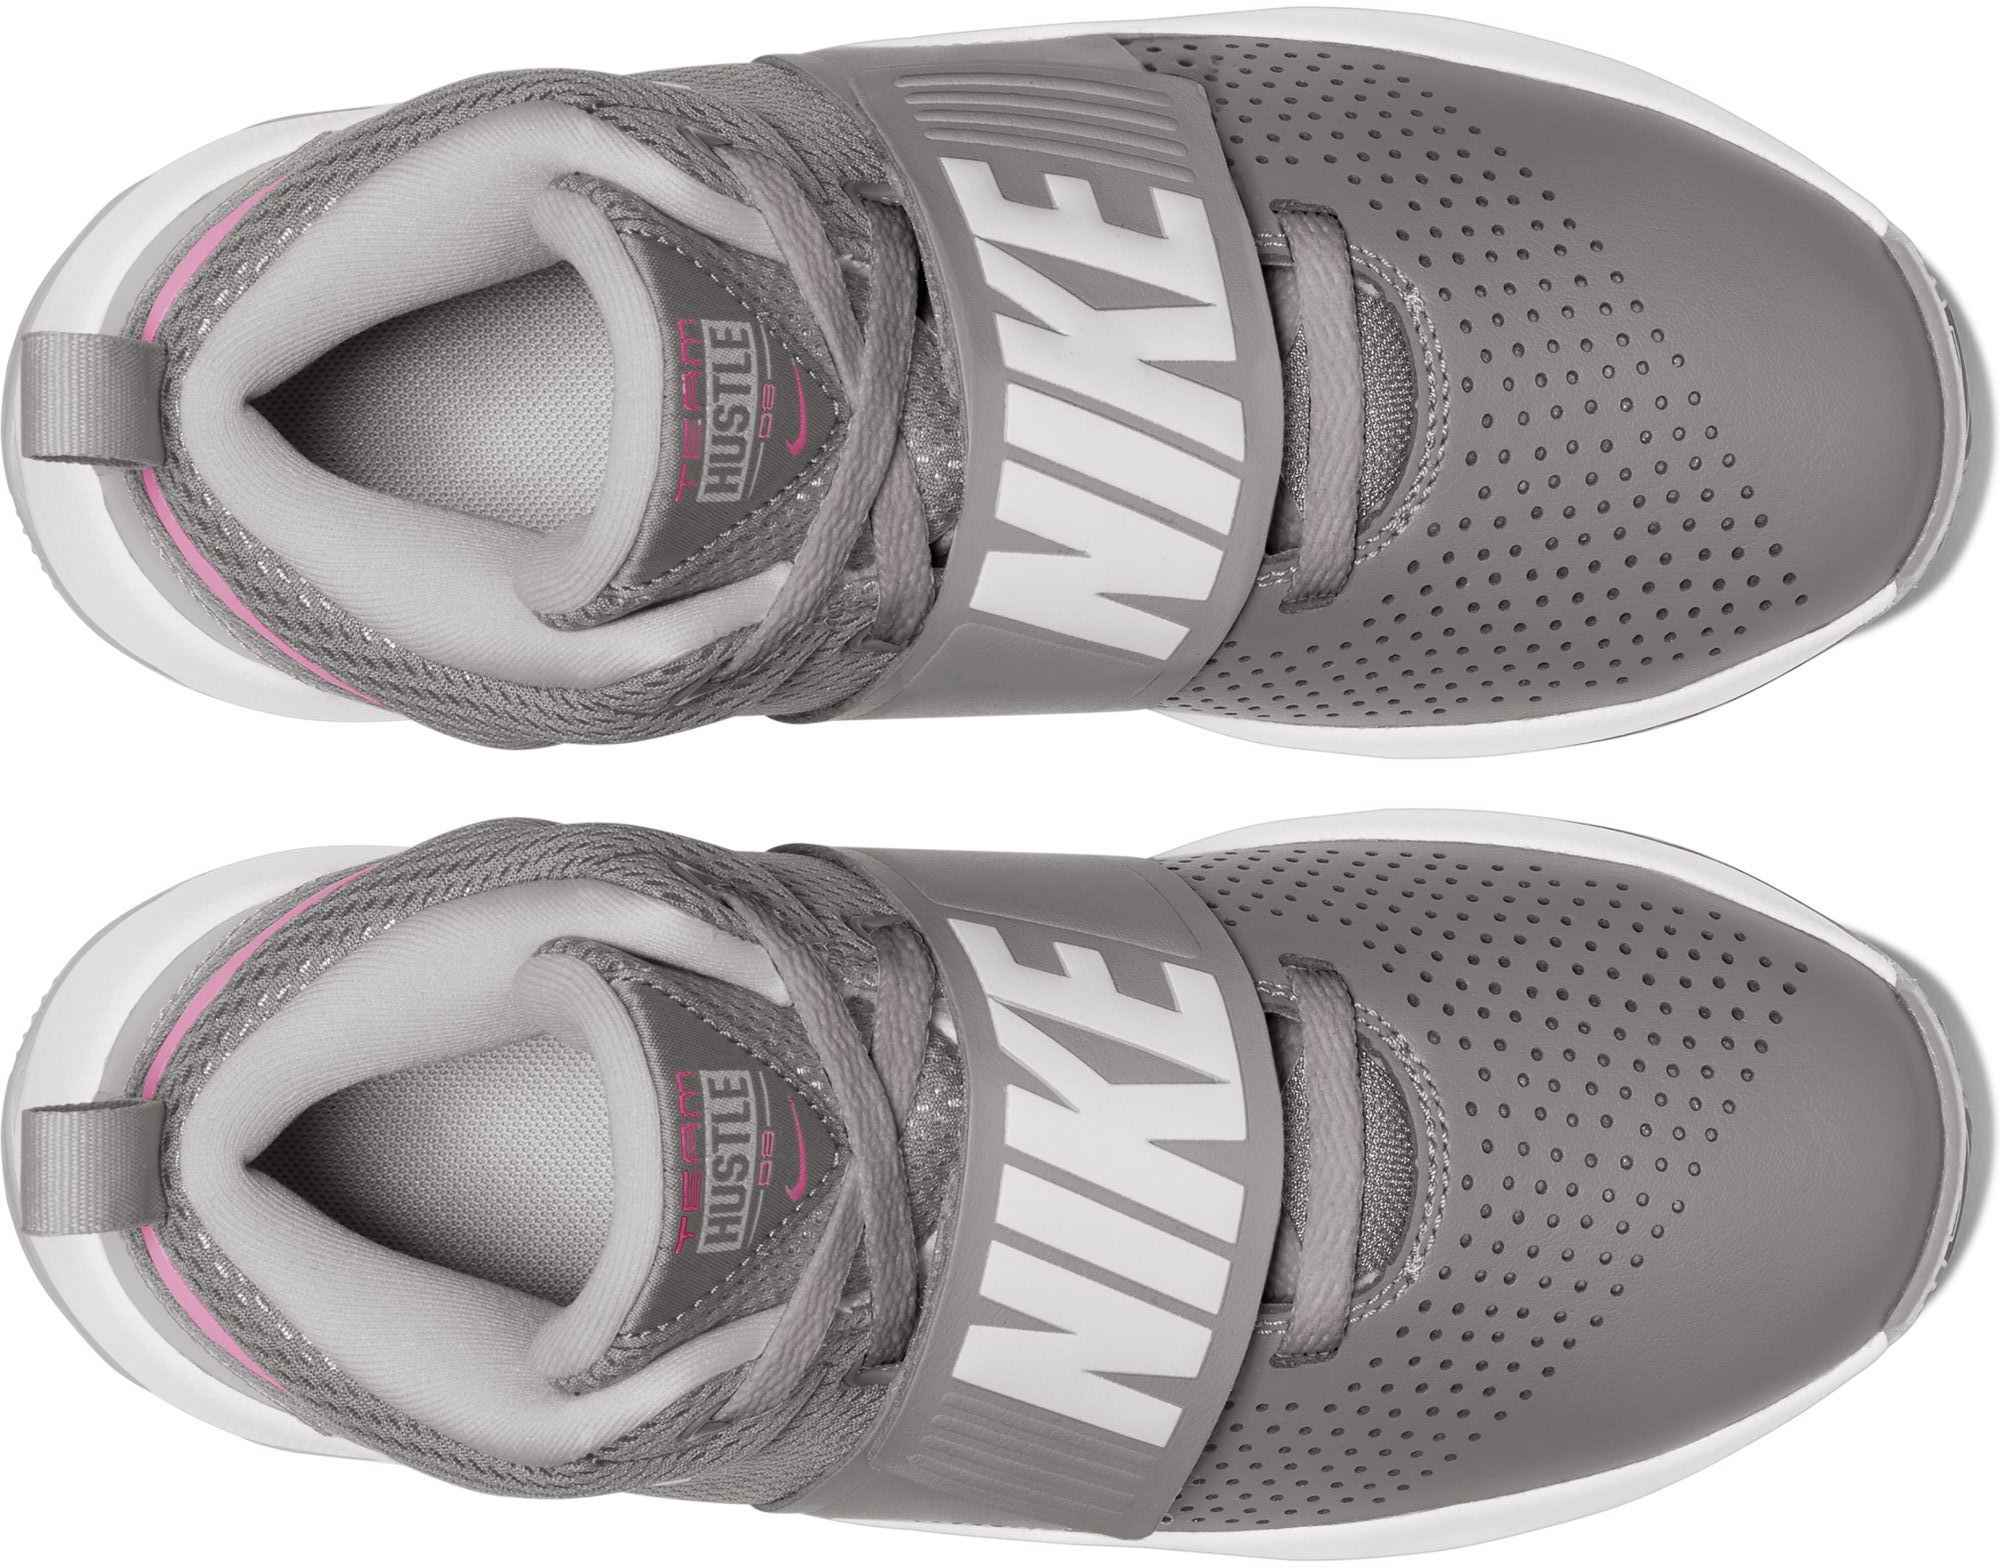 e37ed48efdea4 Nike TEAM HUSTLE D8 GS. Dětská basketbalová obuv. Dětská basketbalová obuv.  Dětská basketbalová obuv. Dětská basketbalová obuv